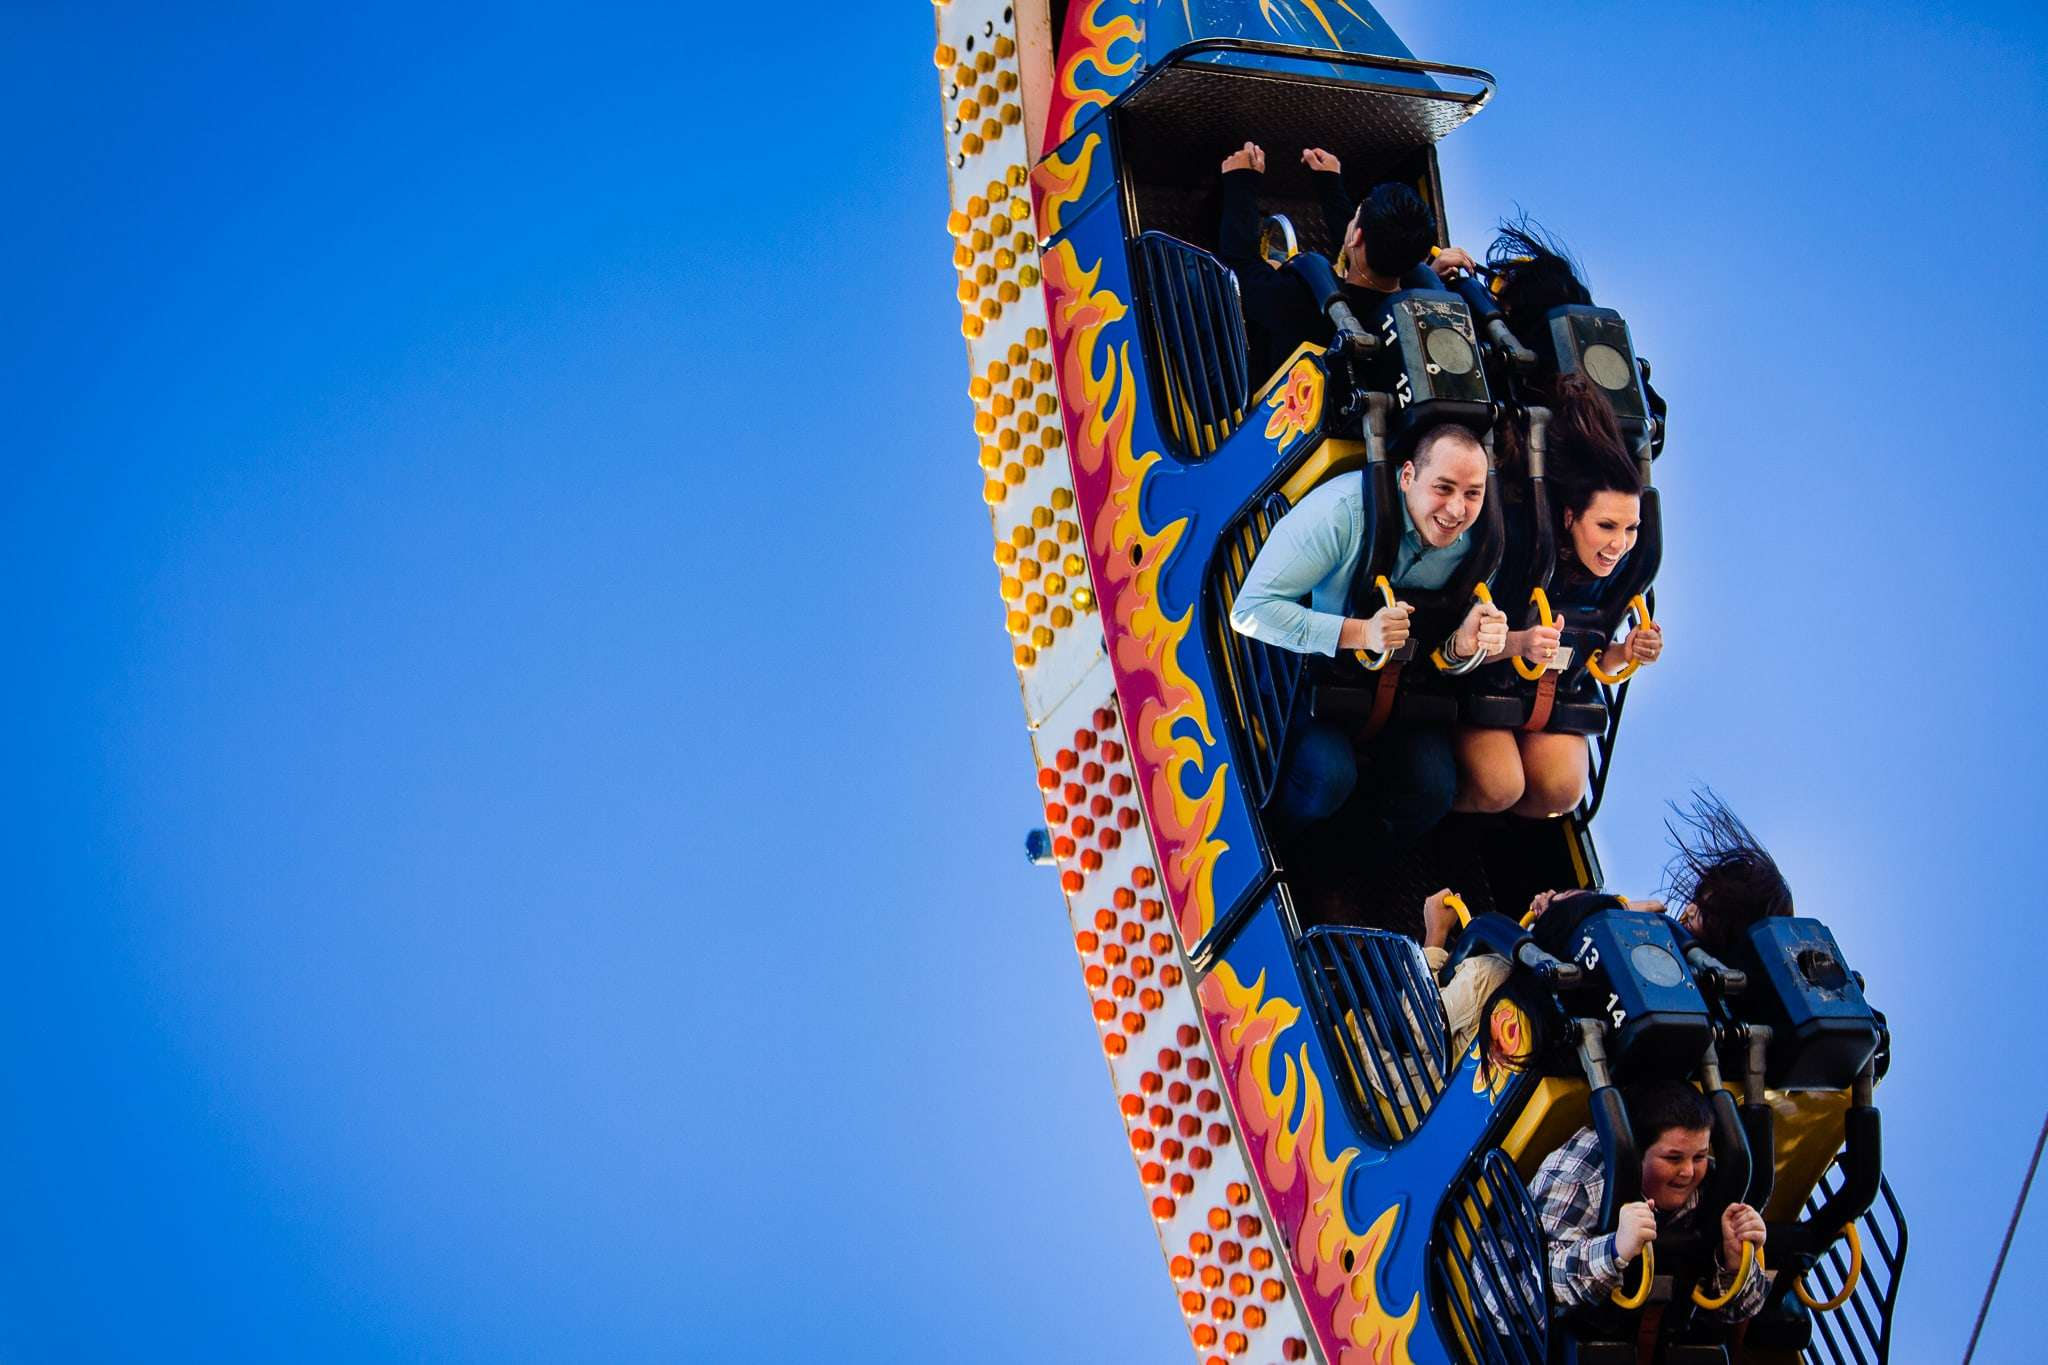 carnival coaster-9795